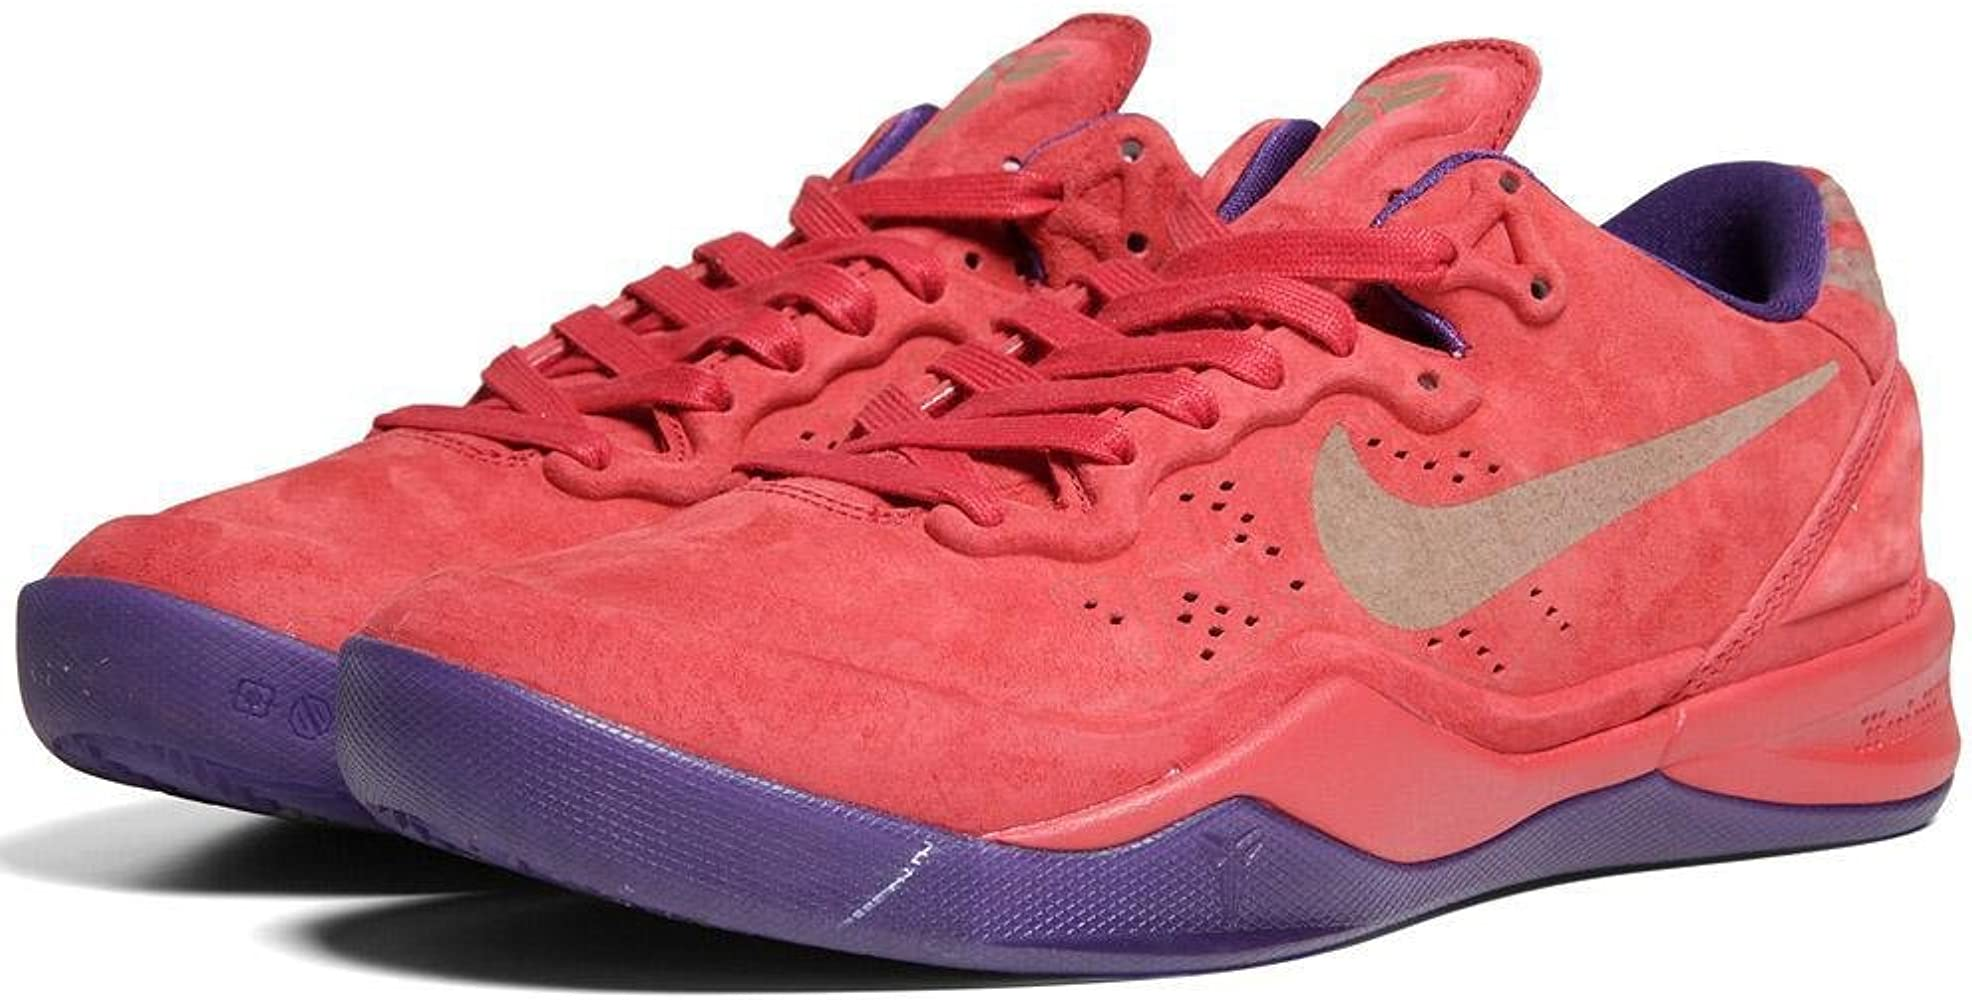 Milagroso tenga en cuenta Desbordamiento  Amazon.com | Nike Zoom Kobe 8 EXT Year of the Snake (582554-600) mens Shoes  | Basketball